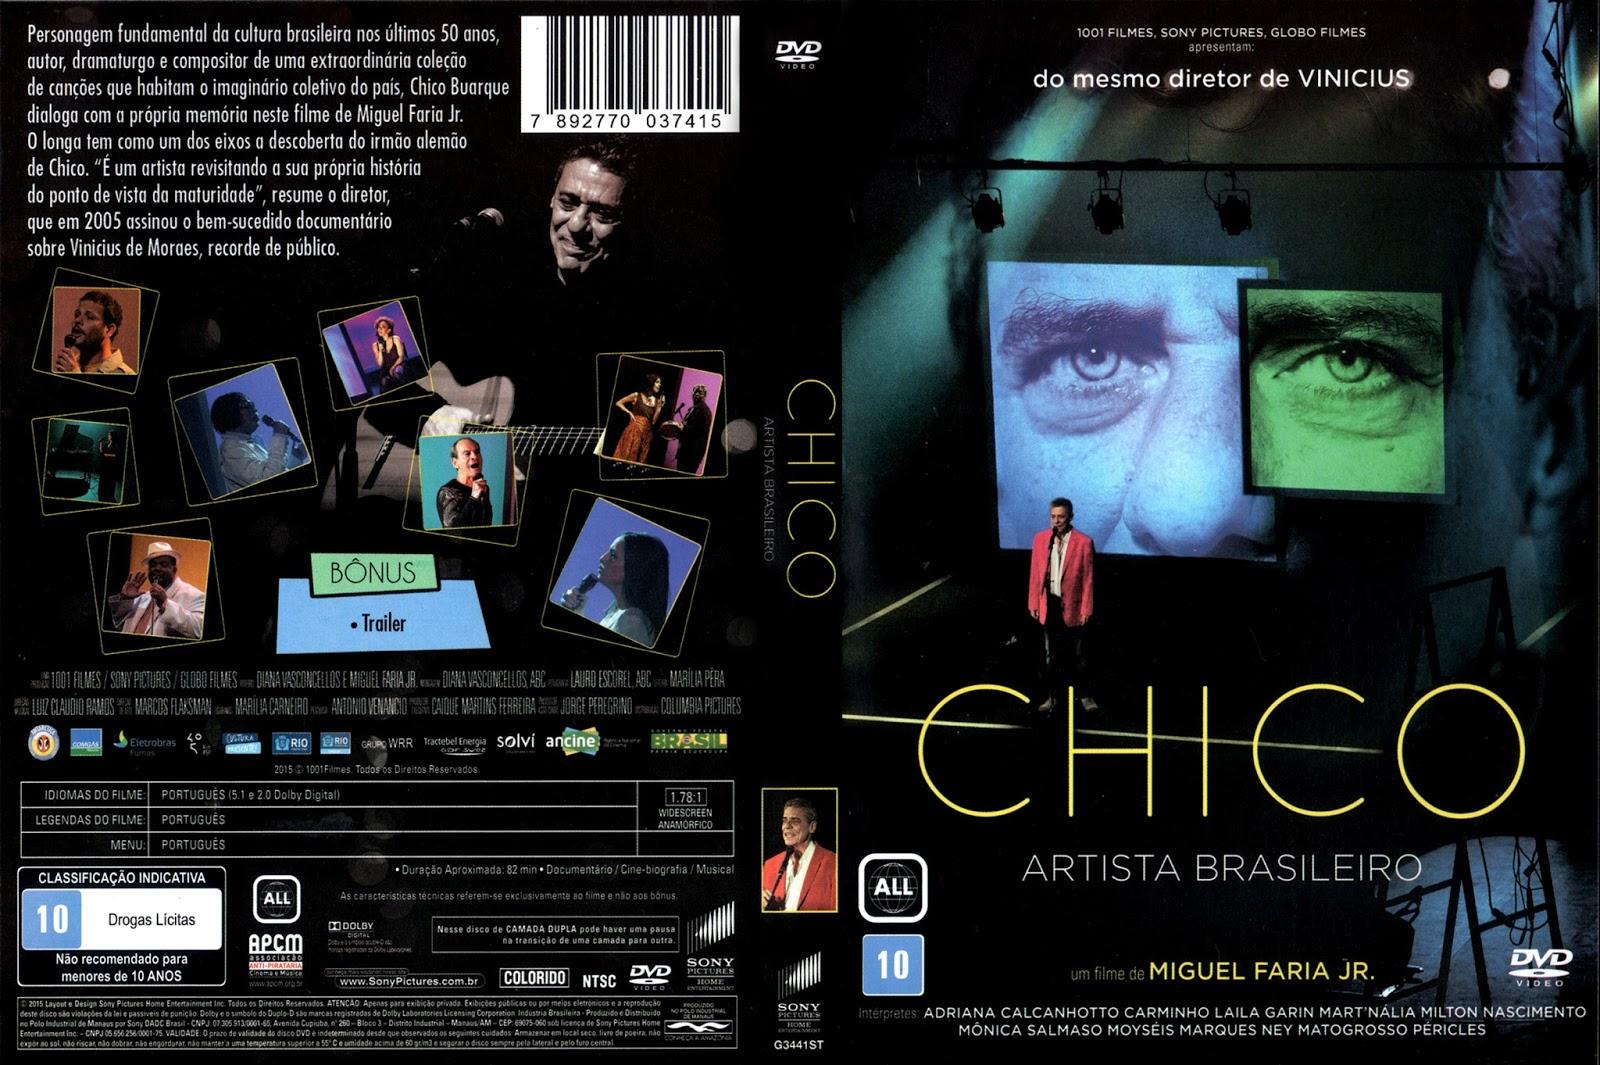 Chico Artista Brasileiro DVDRip XviD Nacional Chico 2BArtista 2BBrasileiro 2B  2BXANDAODOWNLOAD